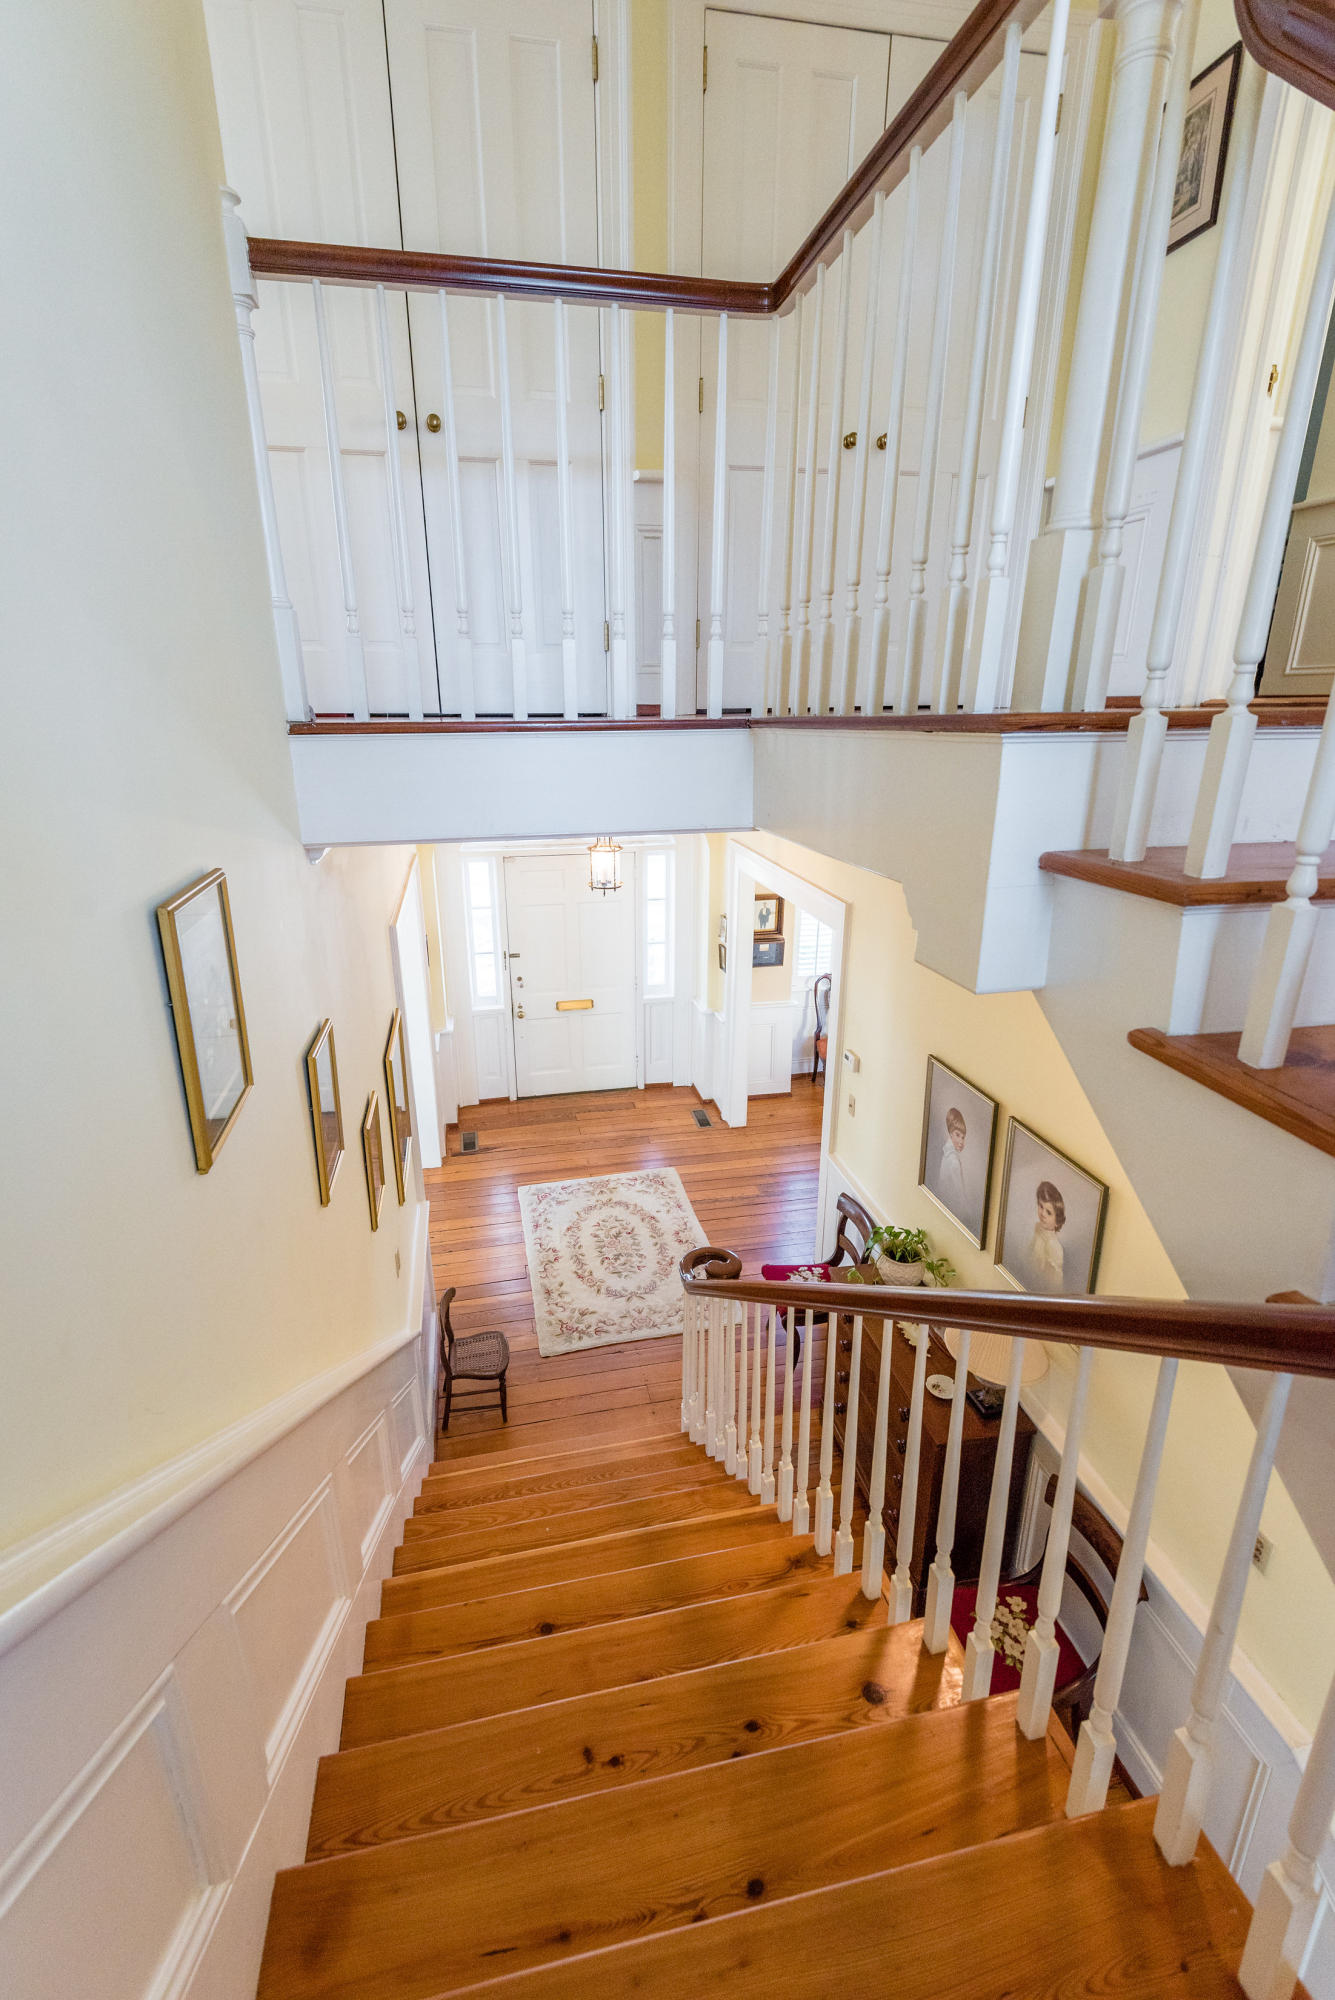 Old Village Homes For Sale - 202 Pitt, Mount Pleasant, SC - 33